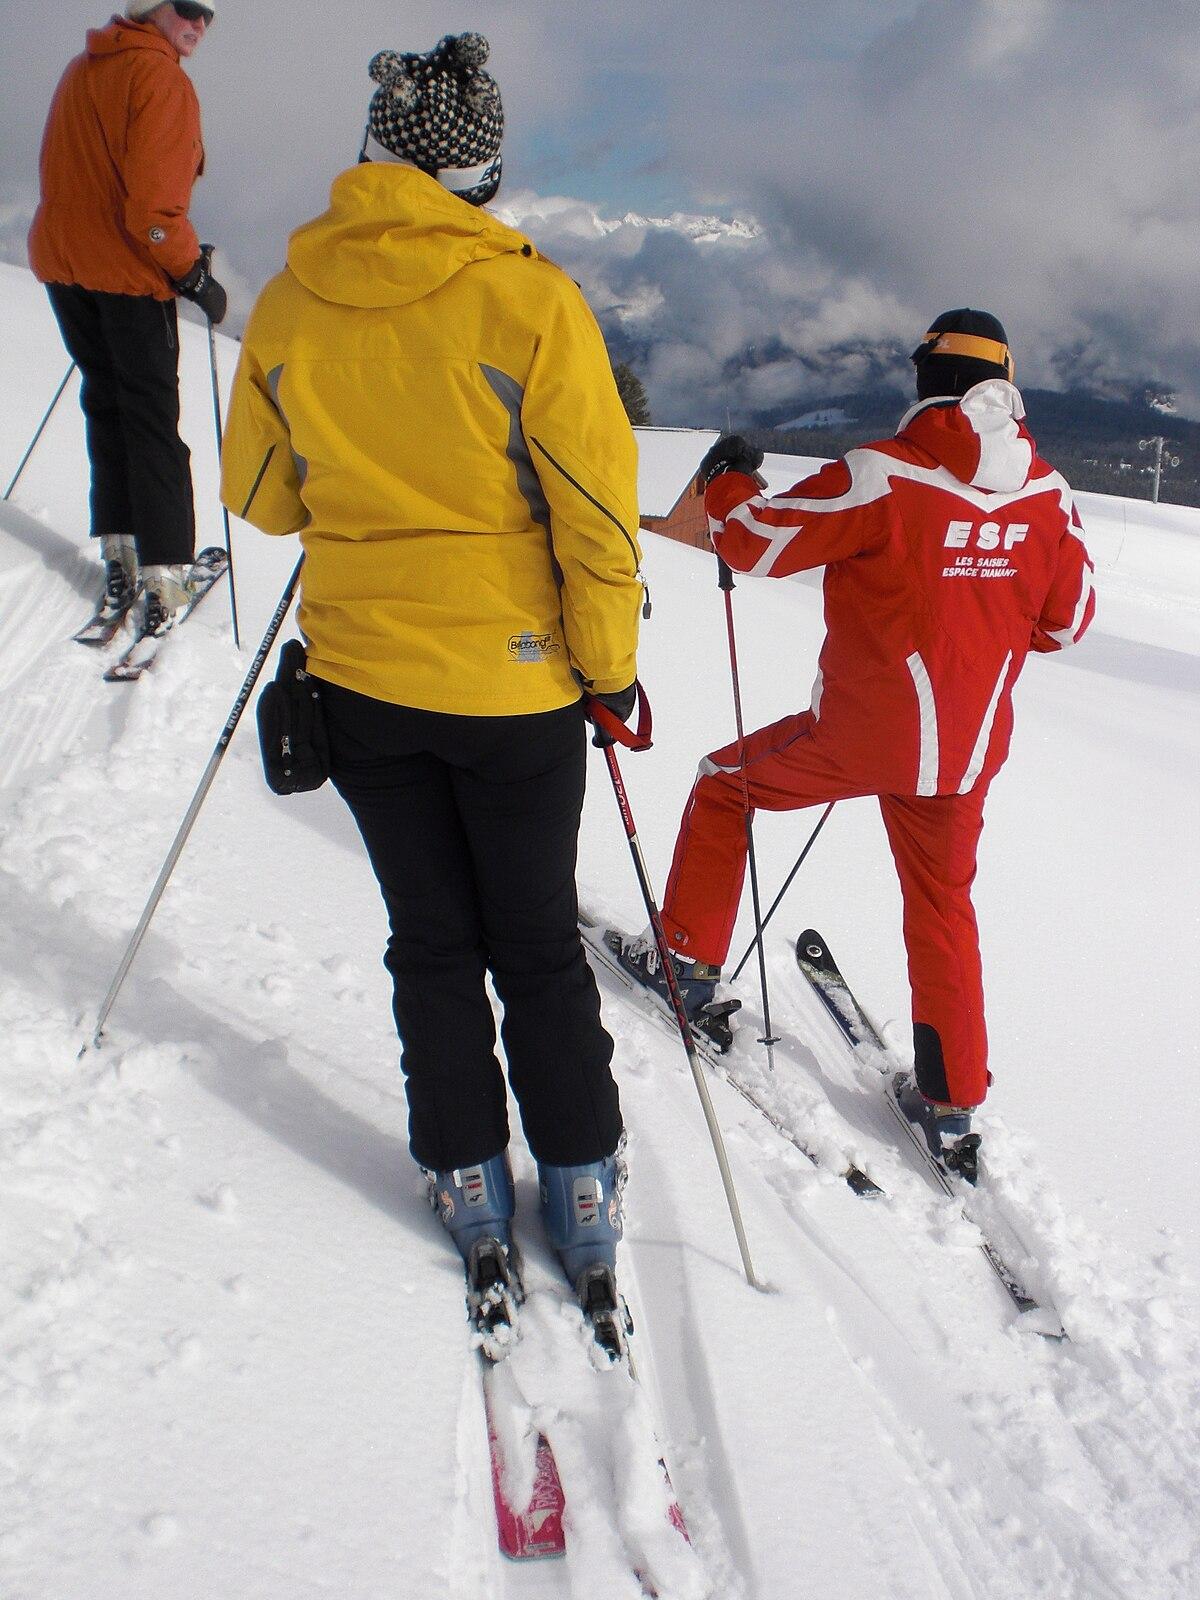 Ski Snowboard Lesson Hot Dogs Freestyle February